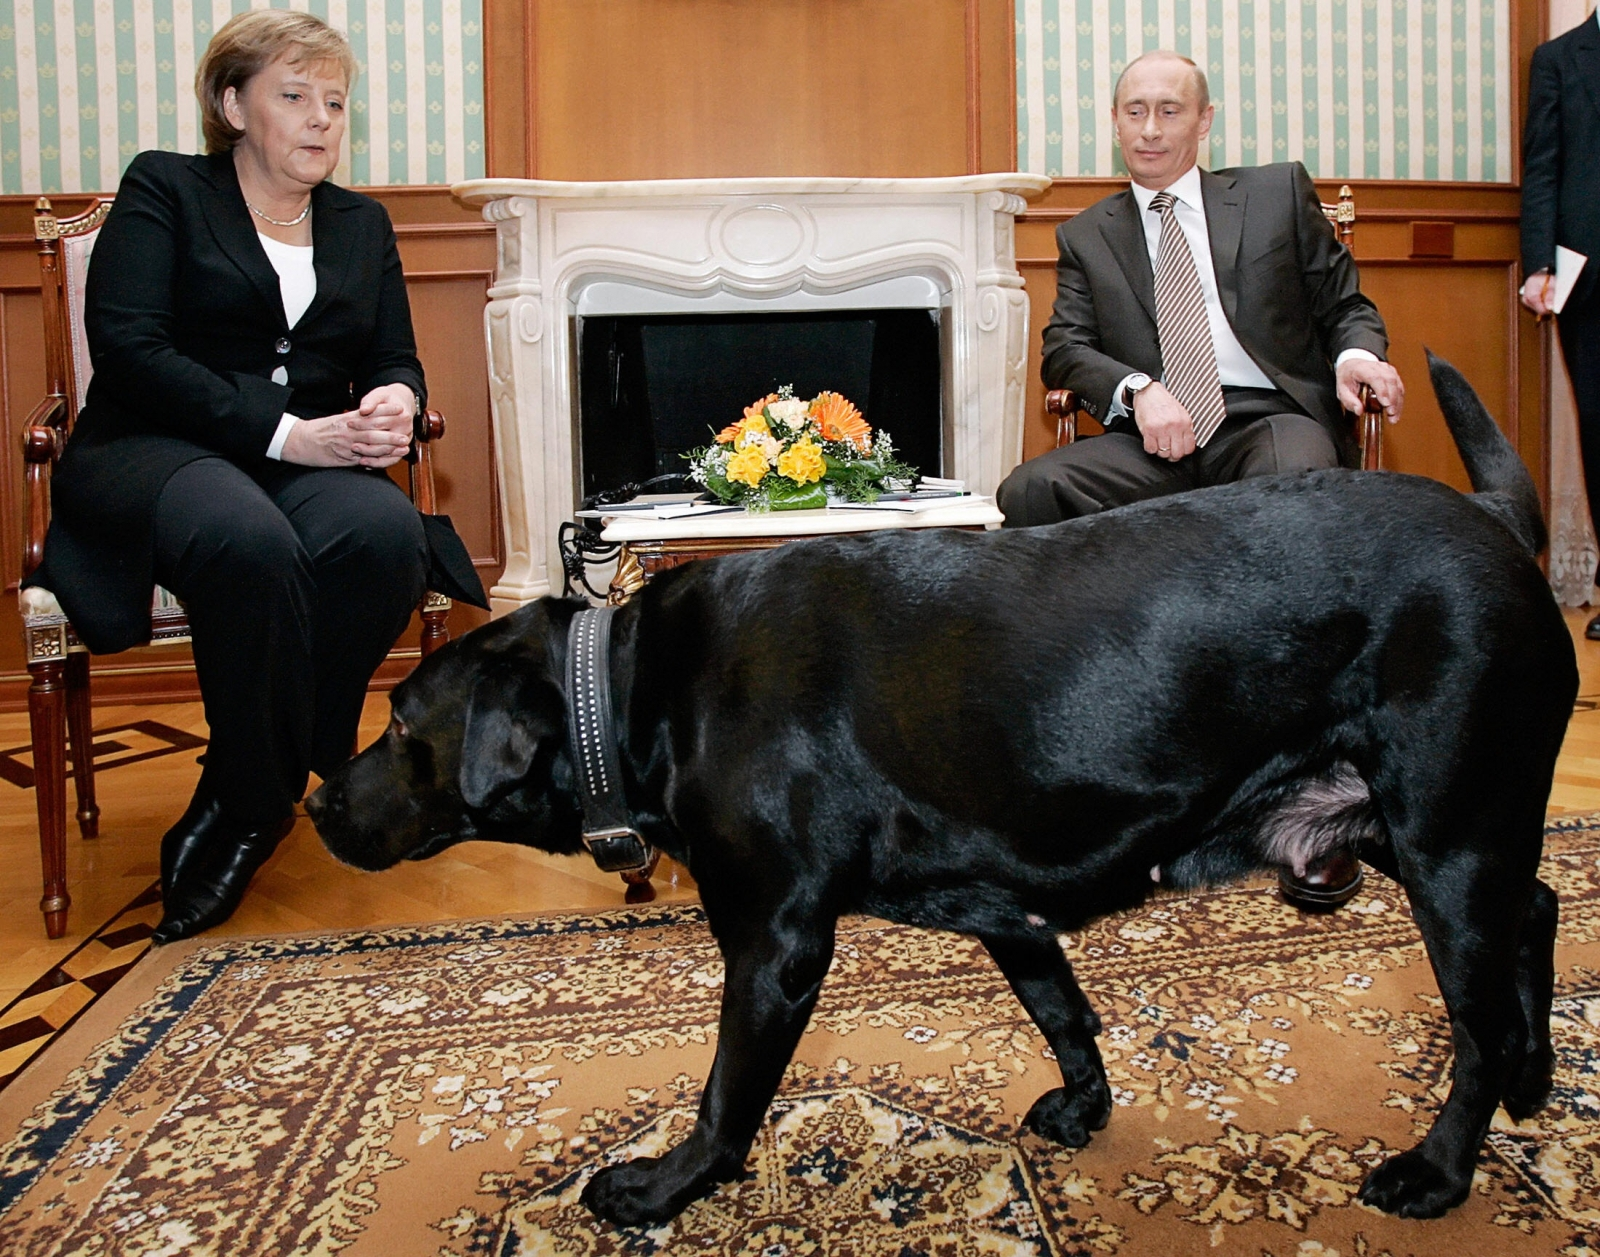 Merkel Putin and a dog